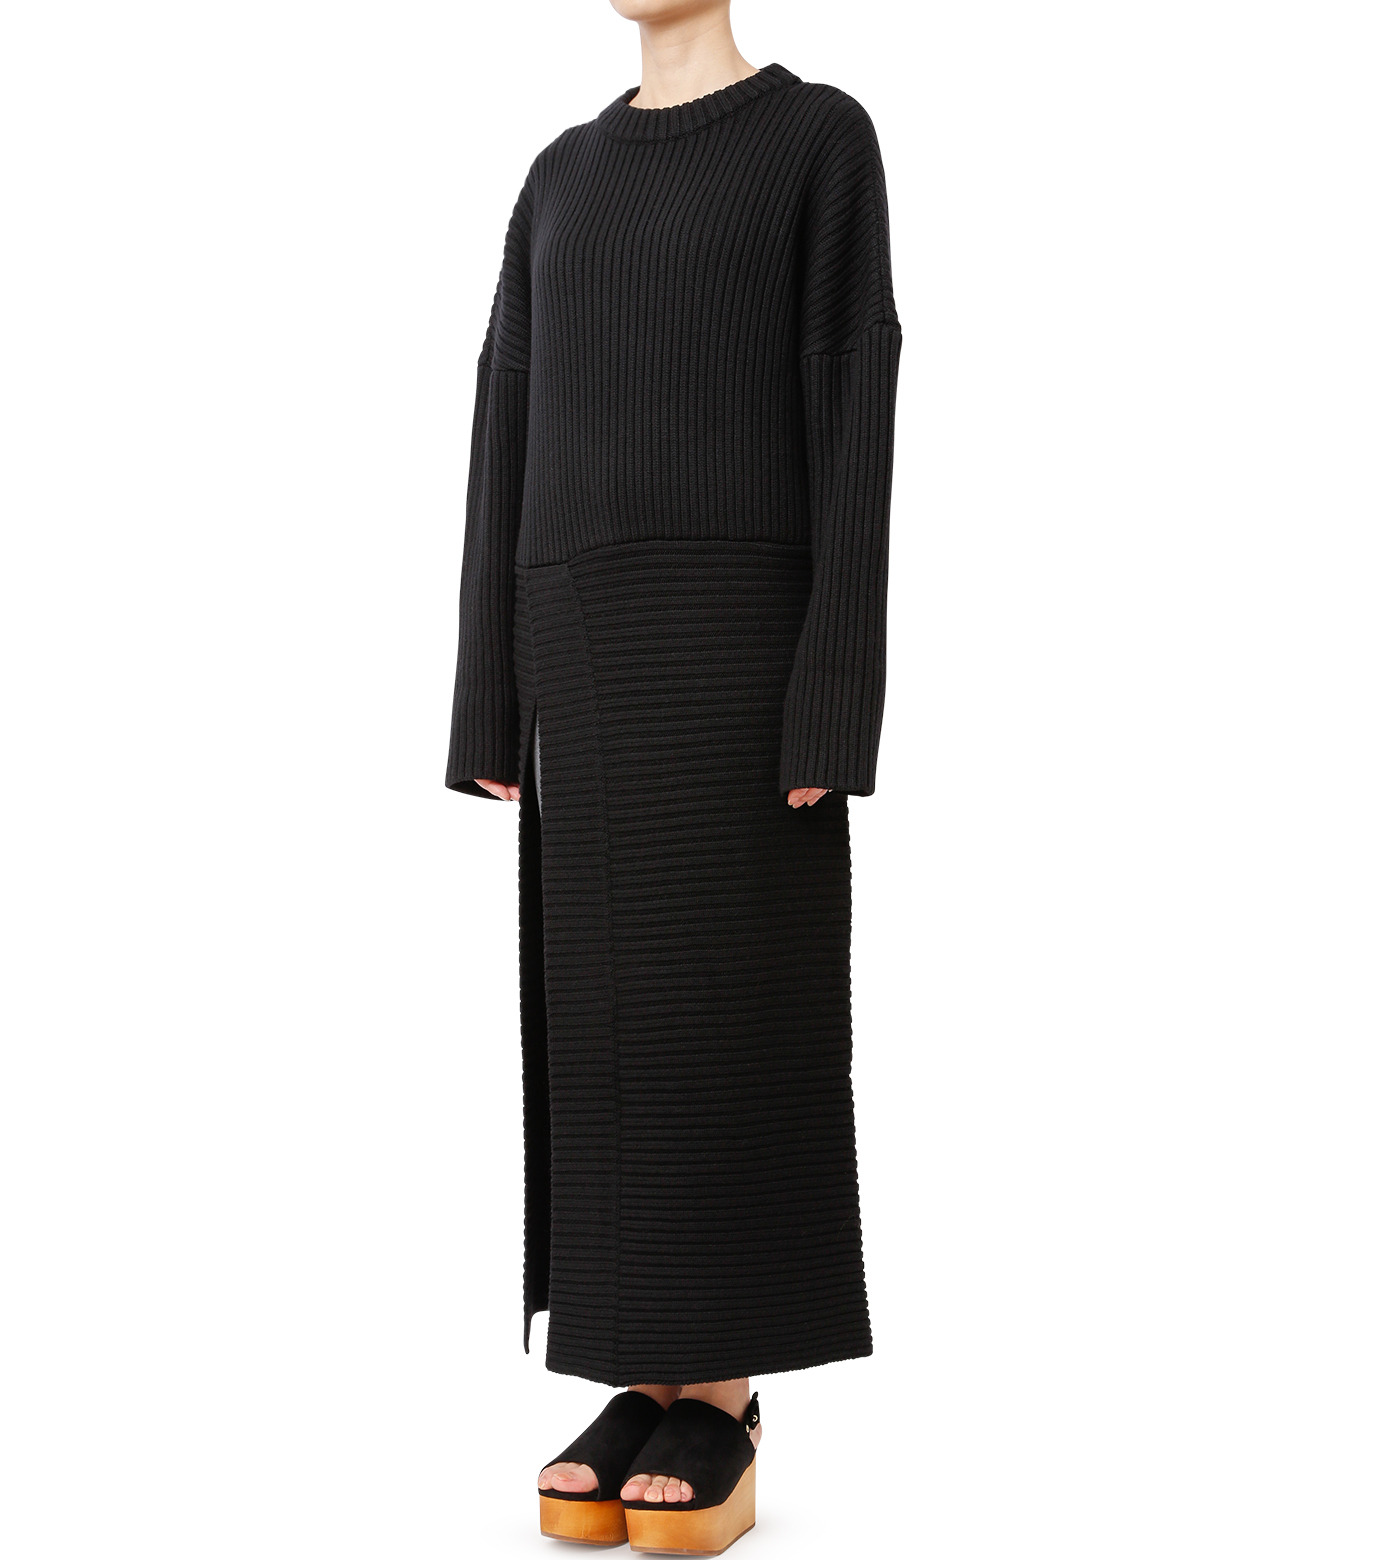 CHRISTIAN DADA(クリスチャン ダダ)のMaxi Knit Dress w/Slit-BLACK(ニット/knit)-16W-D-0806-13 拡大詳細画像1